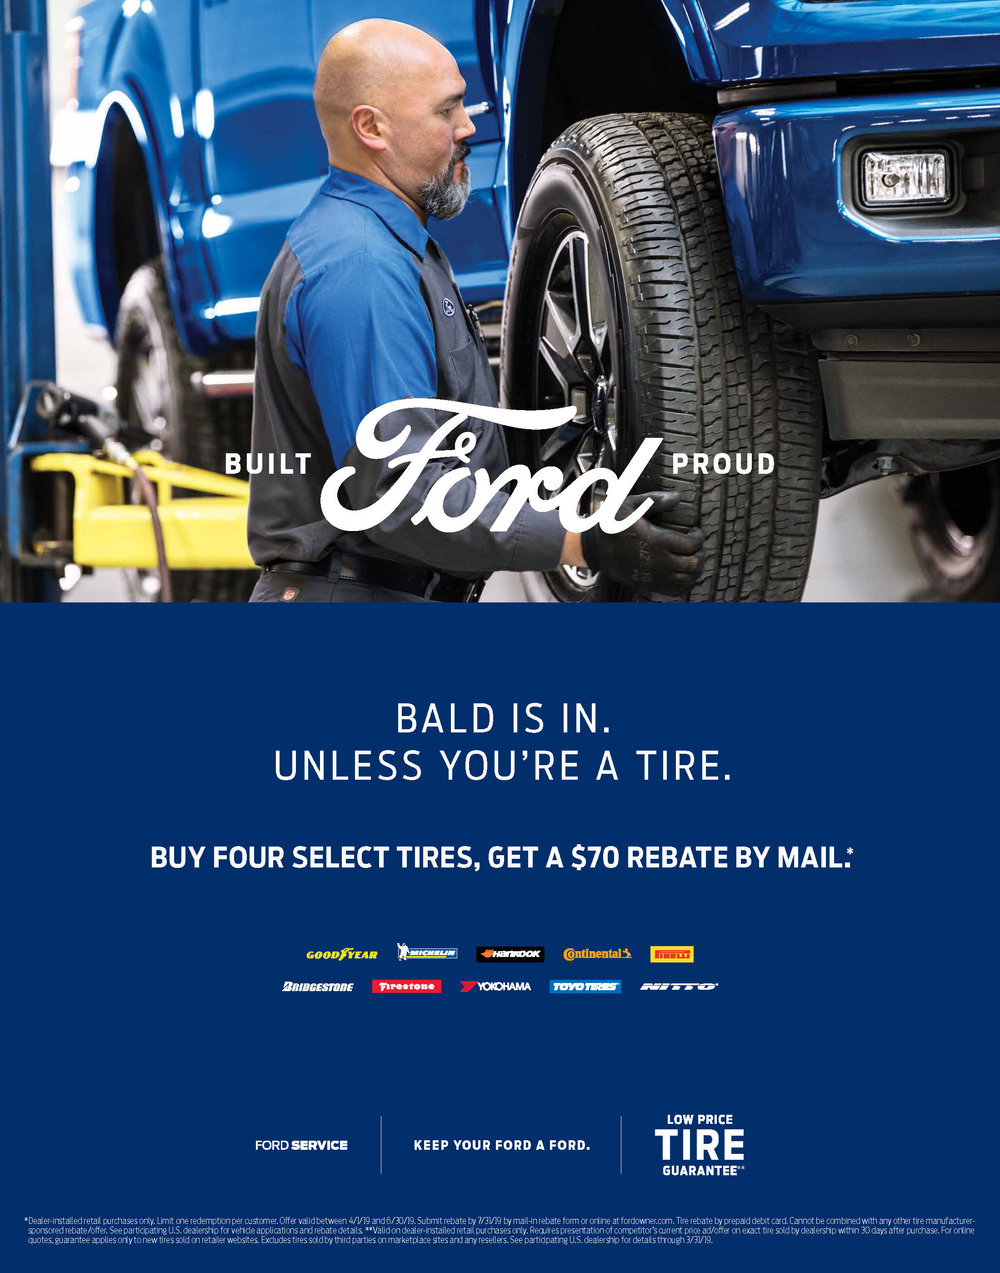 Ford_Bald.jpg